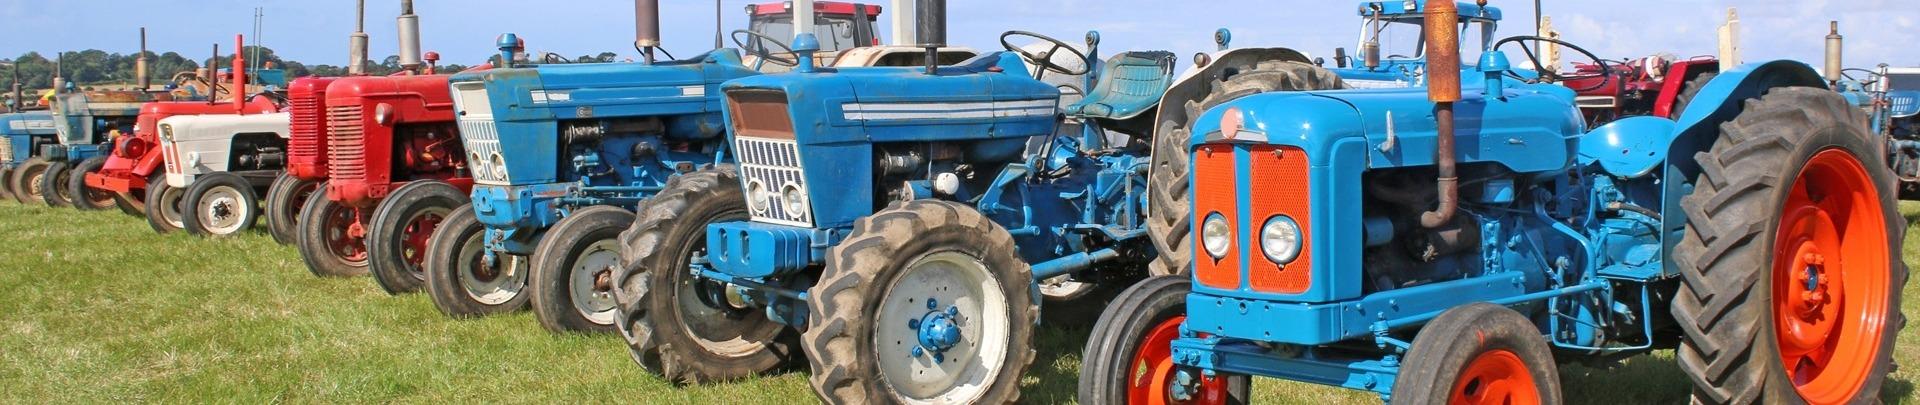 Tractors oldtimer